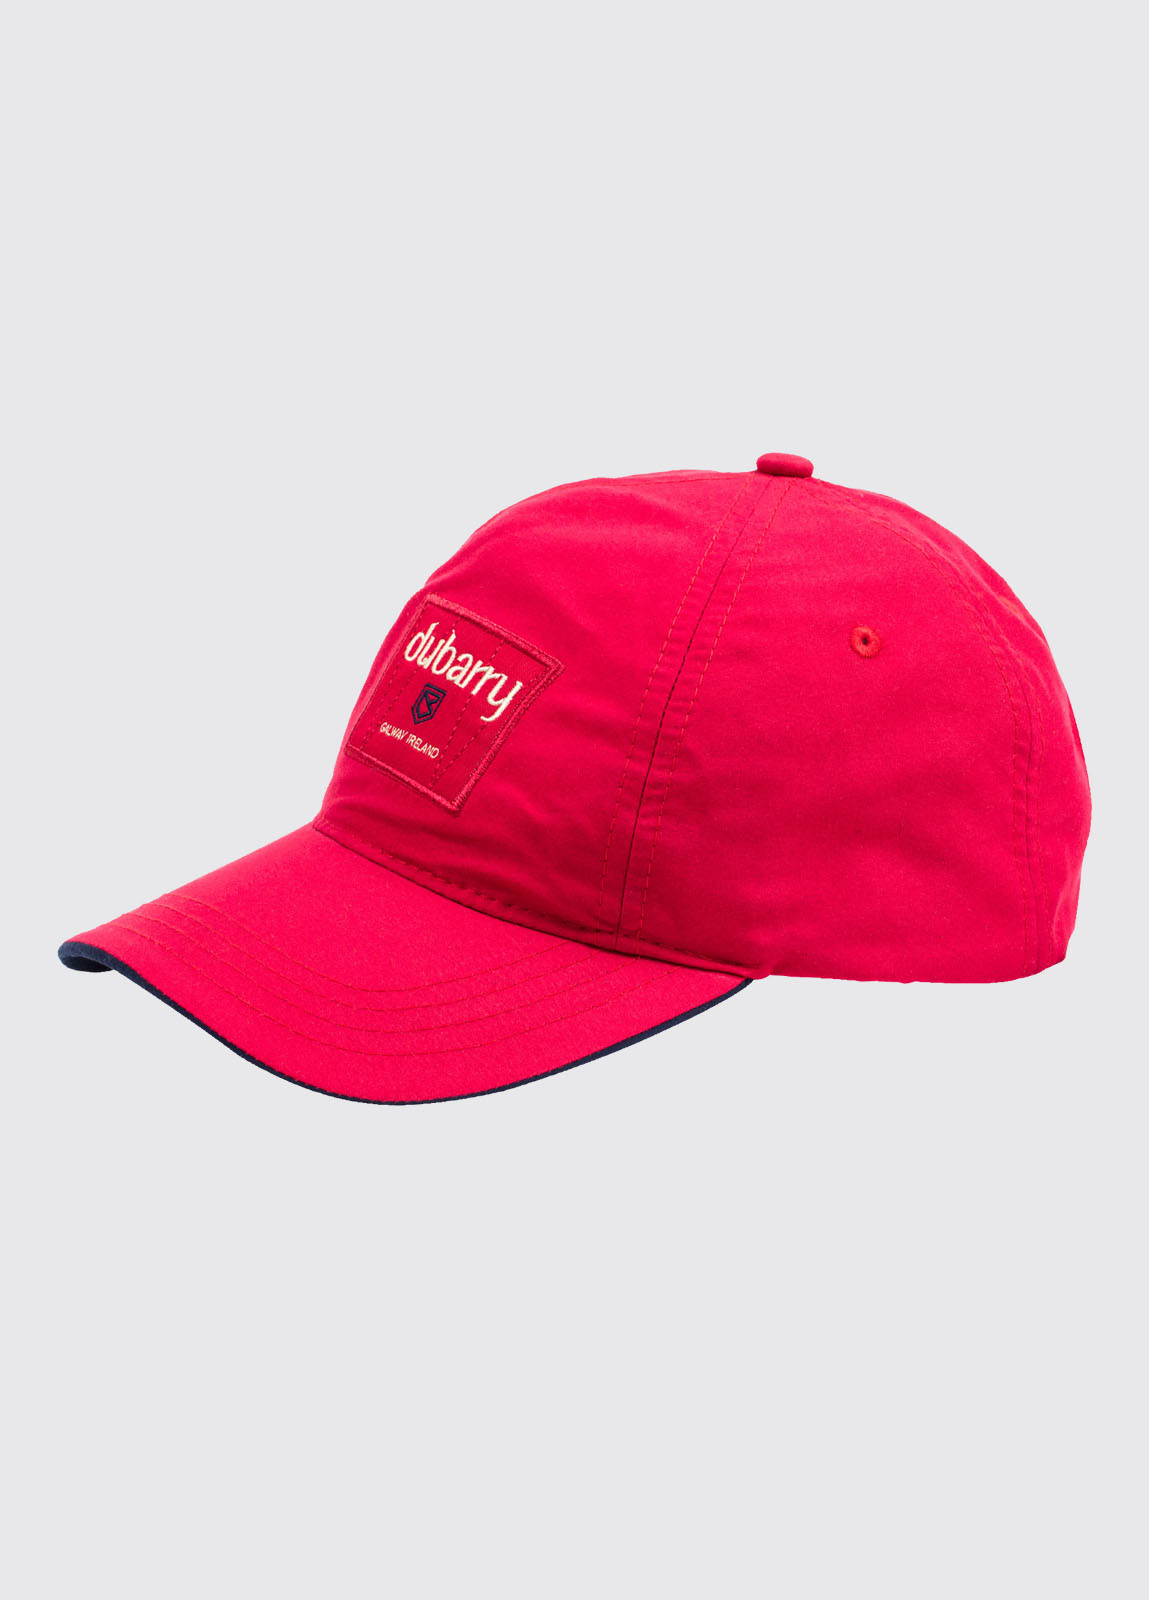 ACHILL - RED